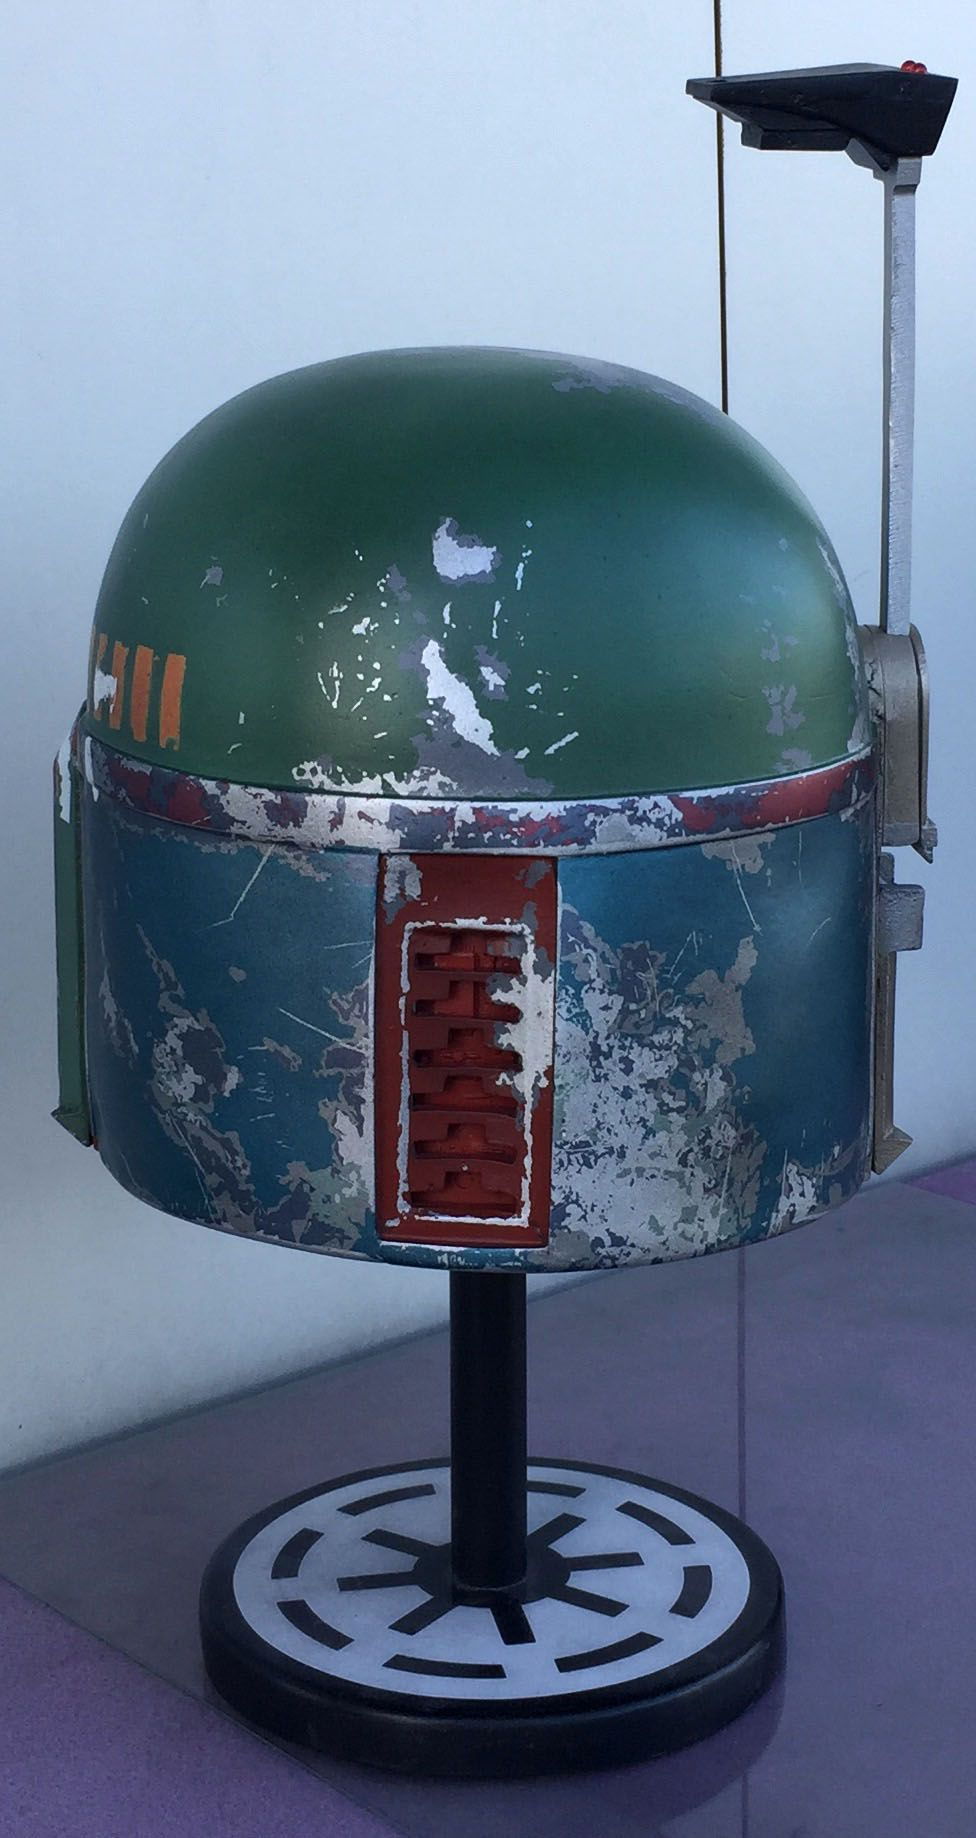 Empire Strikes Back - Boba Fett Helmet Rear View - Fan Made | Boba ...